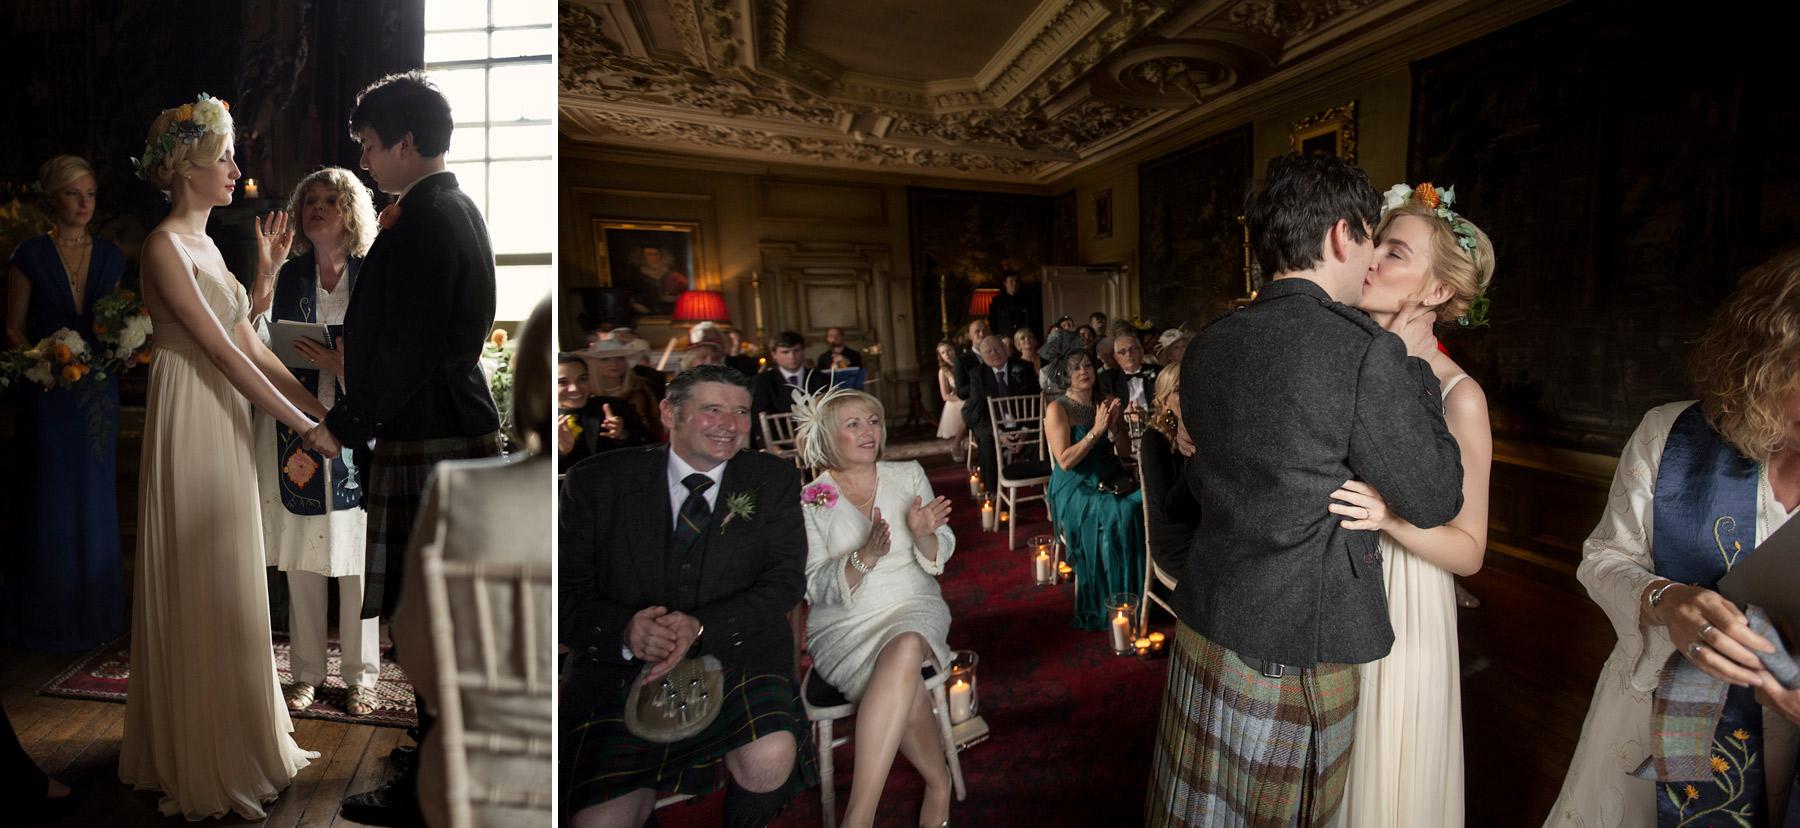 wedding ceremony at magician stuart mcleods wedding